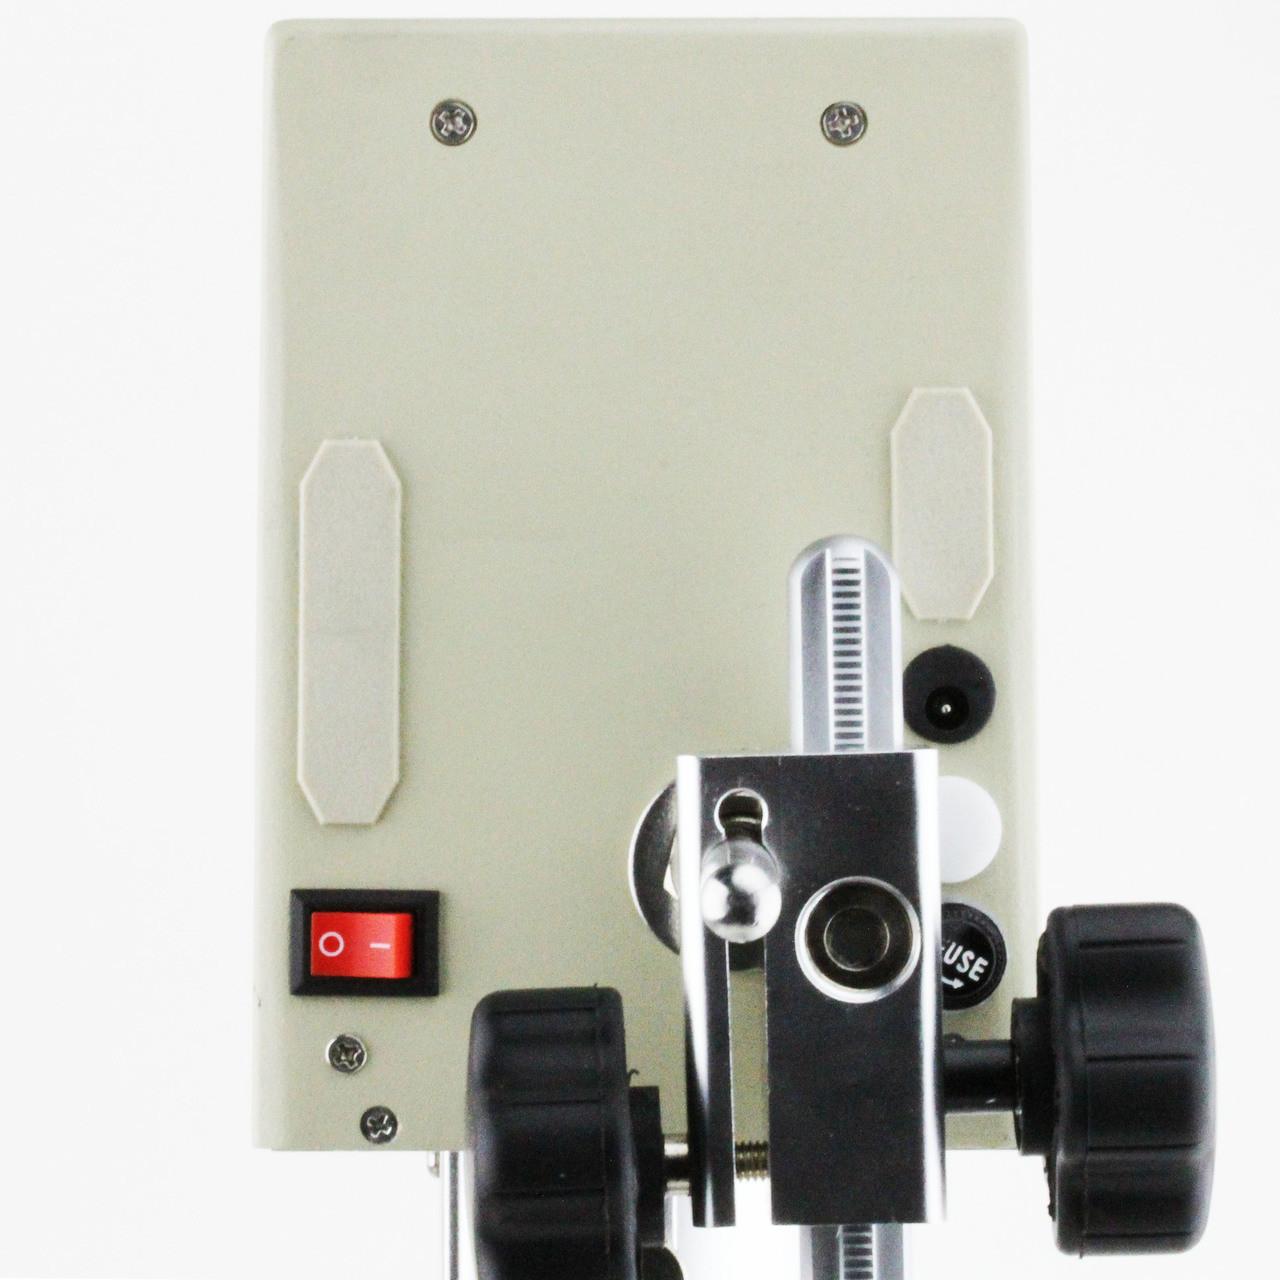 U.S. Solid Rotary Viscometer Viscosity Meter w/ LCD Display Screen 1-1×100000 mPa·s